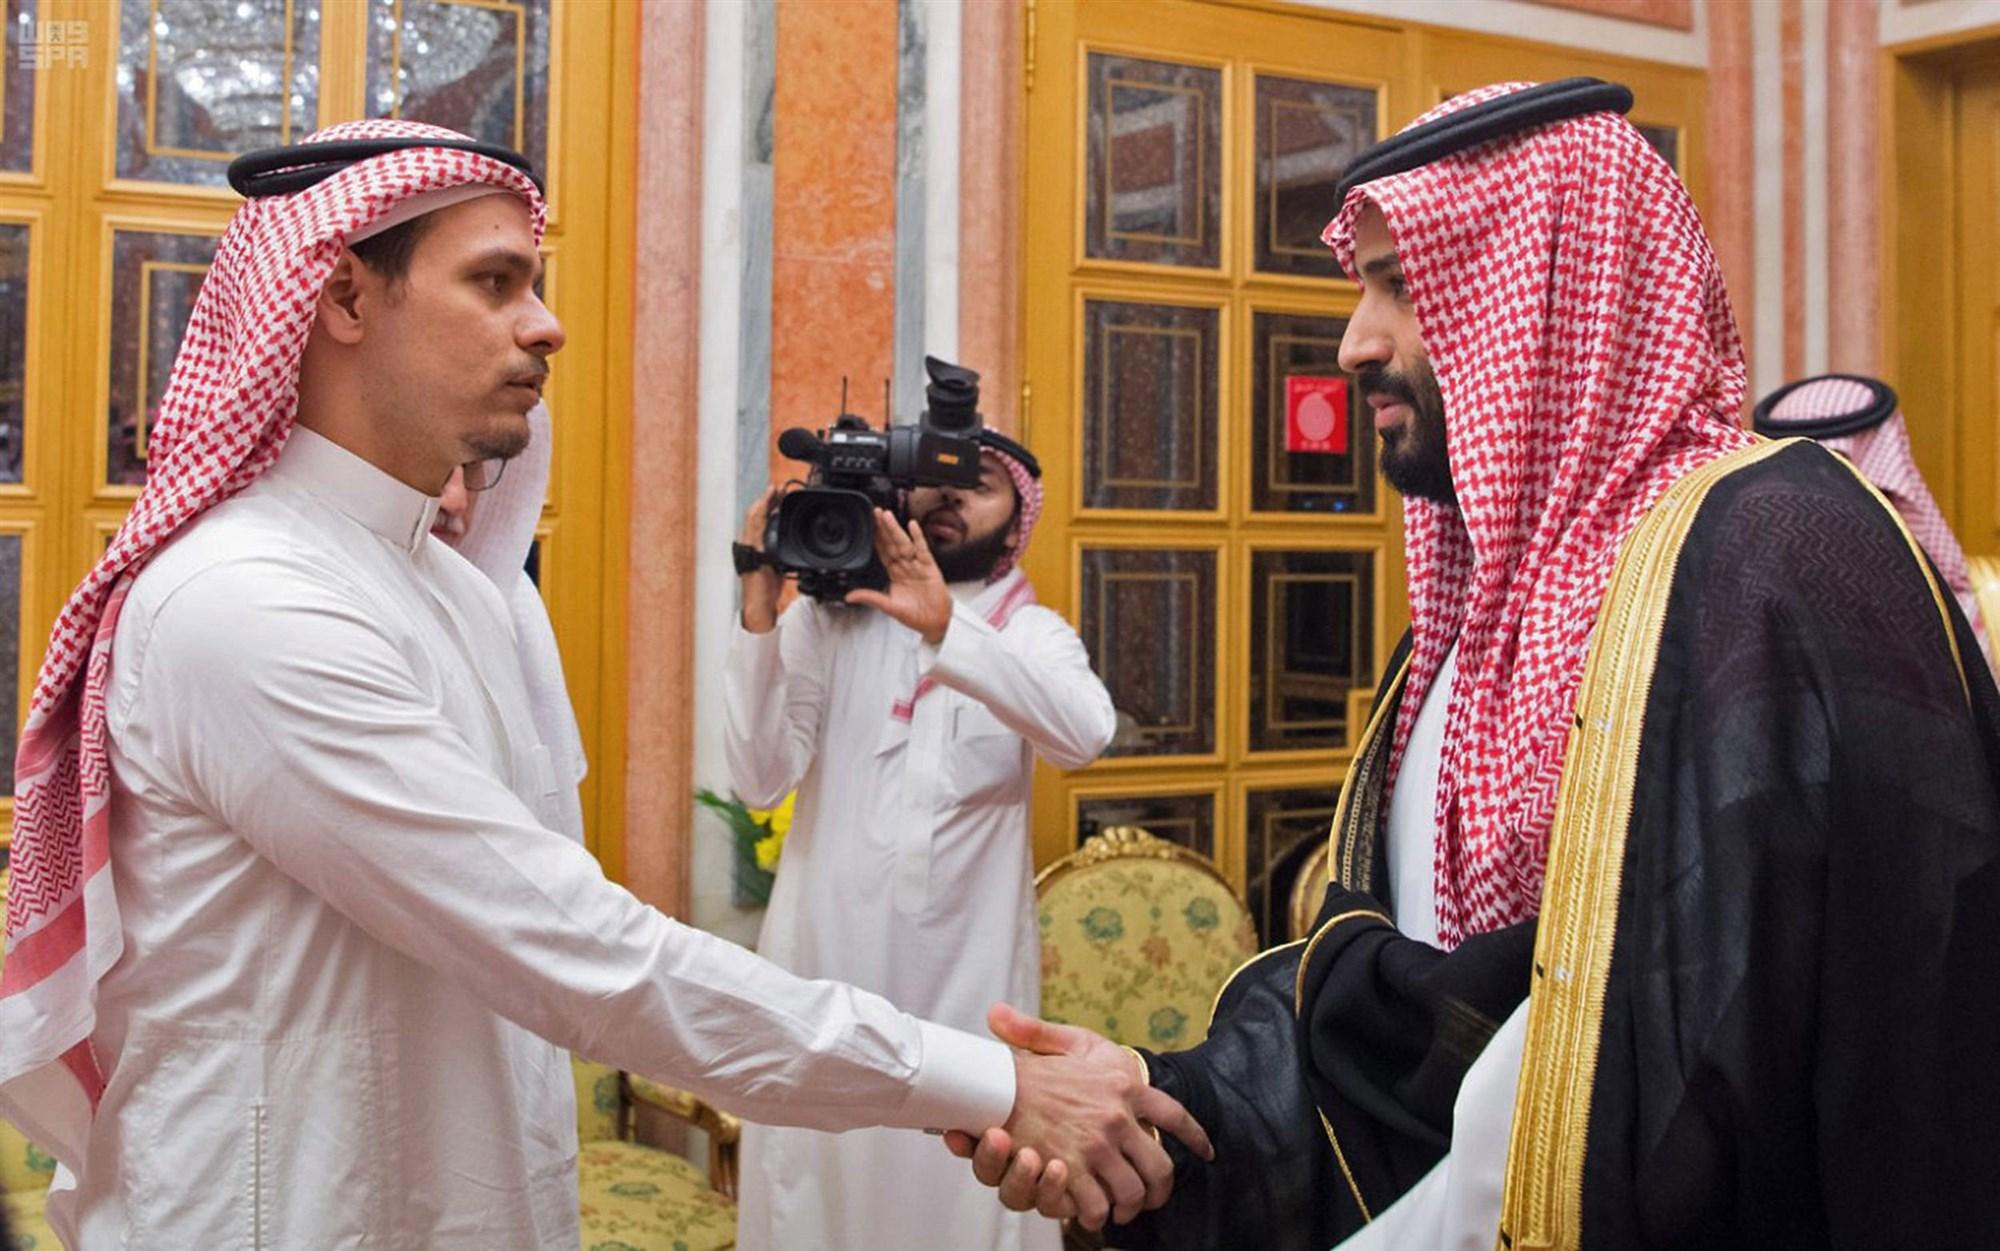 Saudi Crown Prince Mohammed bin Salman, right, shakes hand with Jamal Khashoggi's son Salah in Riyadh. (Credit: Saudi Press Agency / AFP - Getty Images)